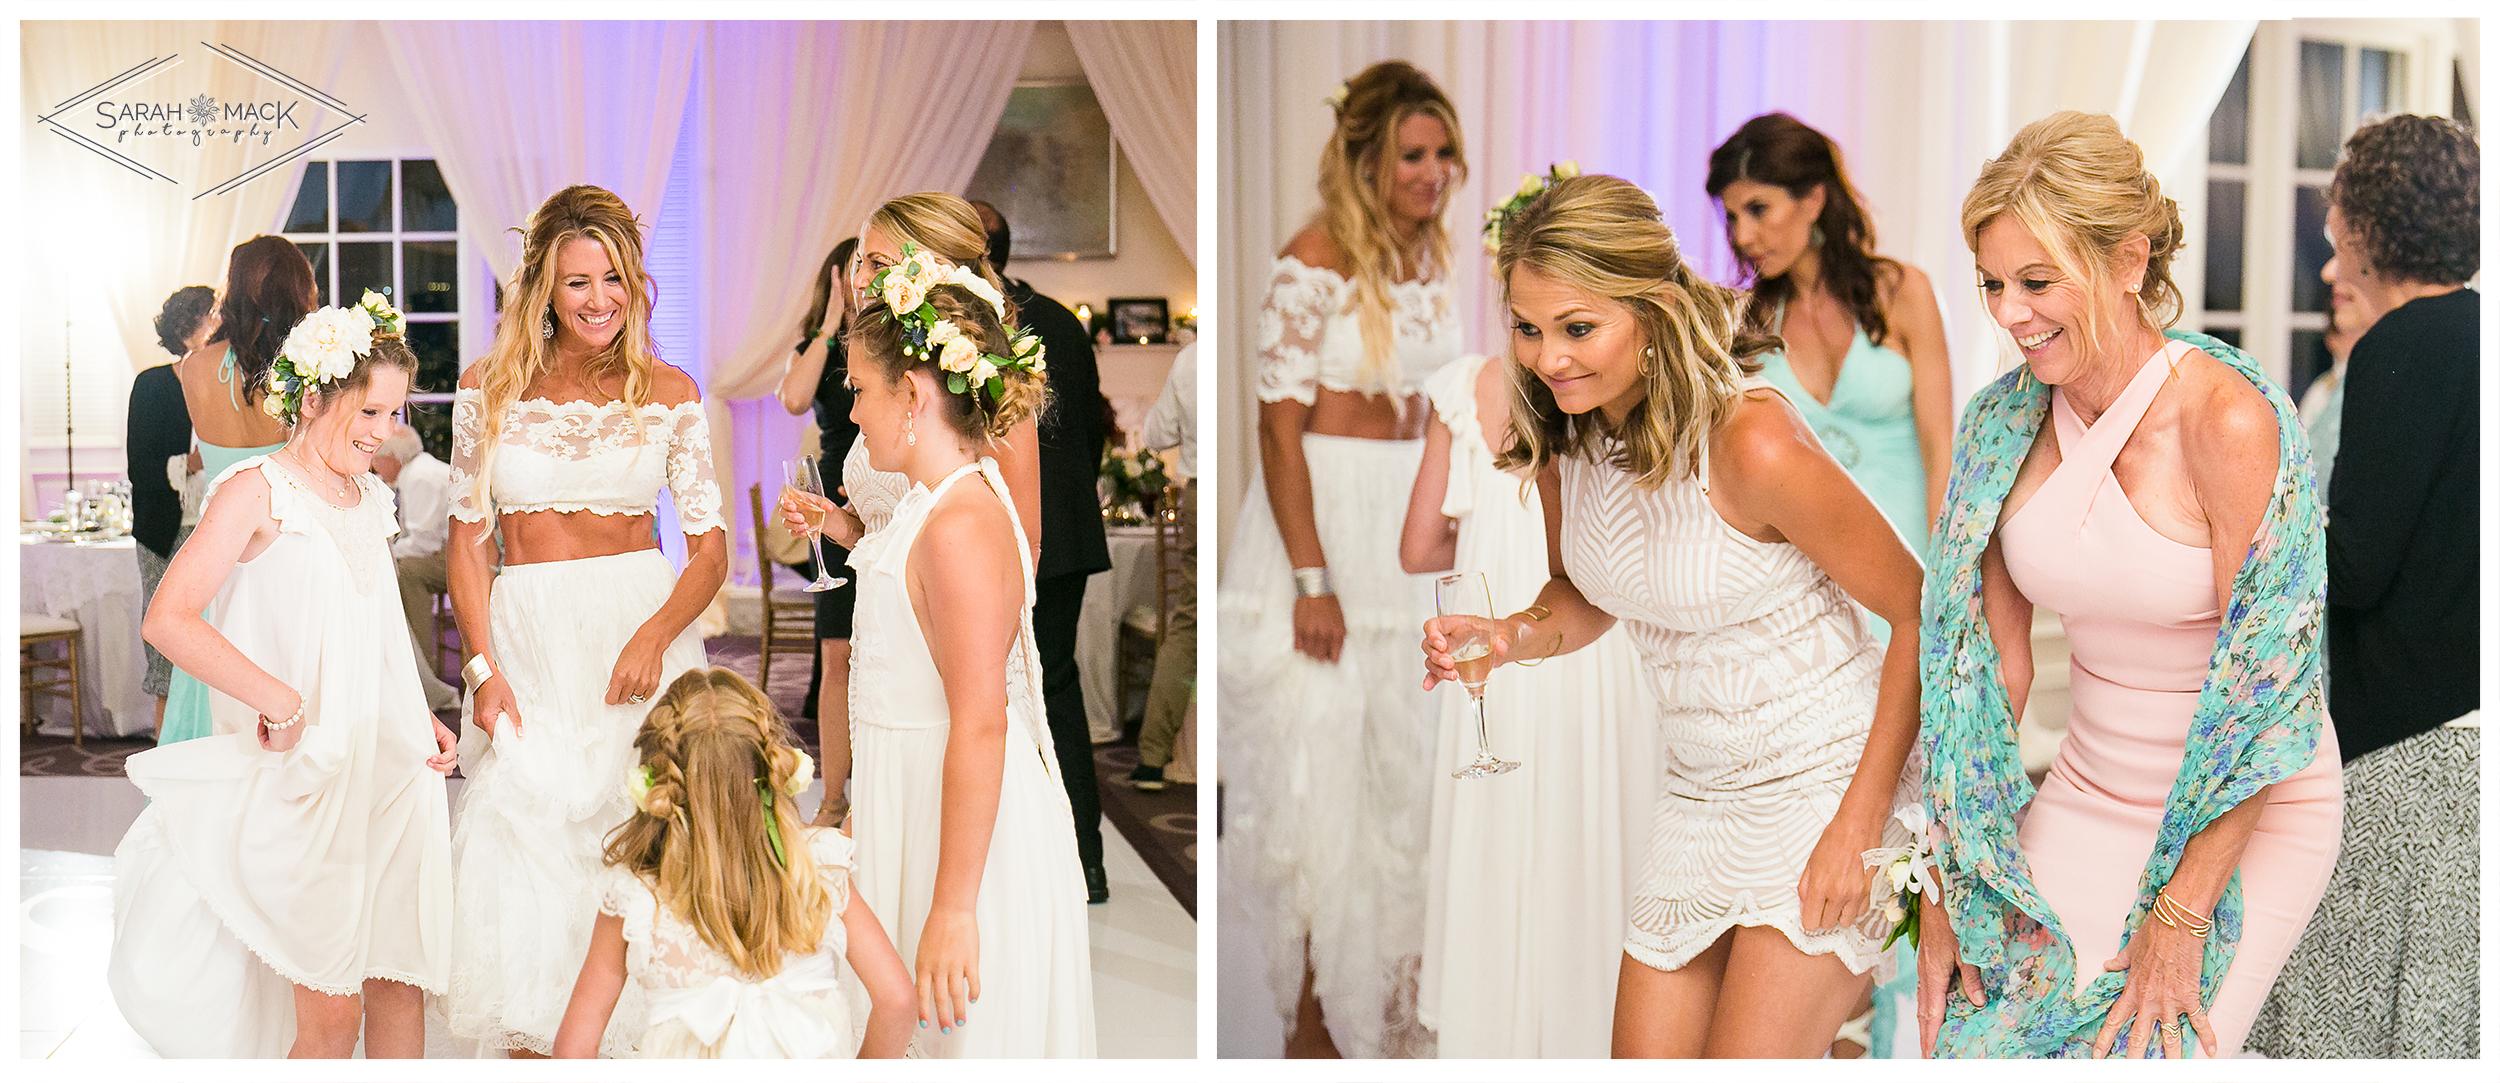 TD-Ritz-Carlton-Laguna-Niguel-Wedding-Photography-37.jpg